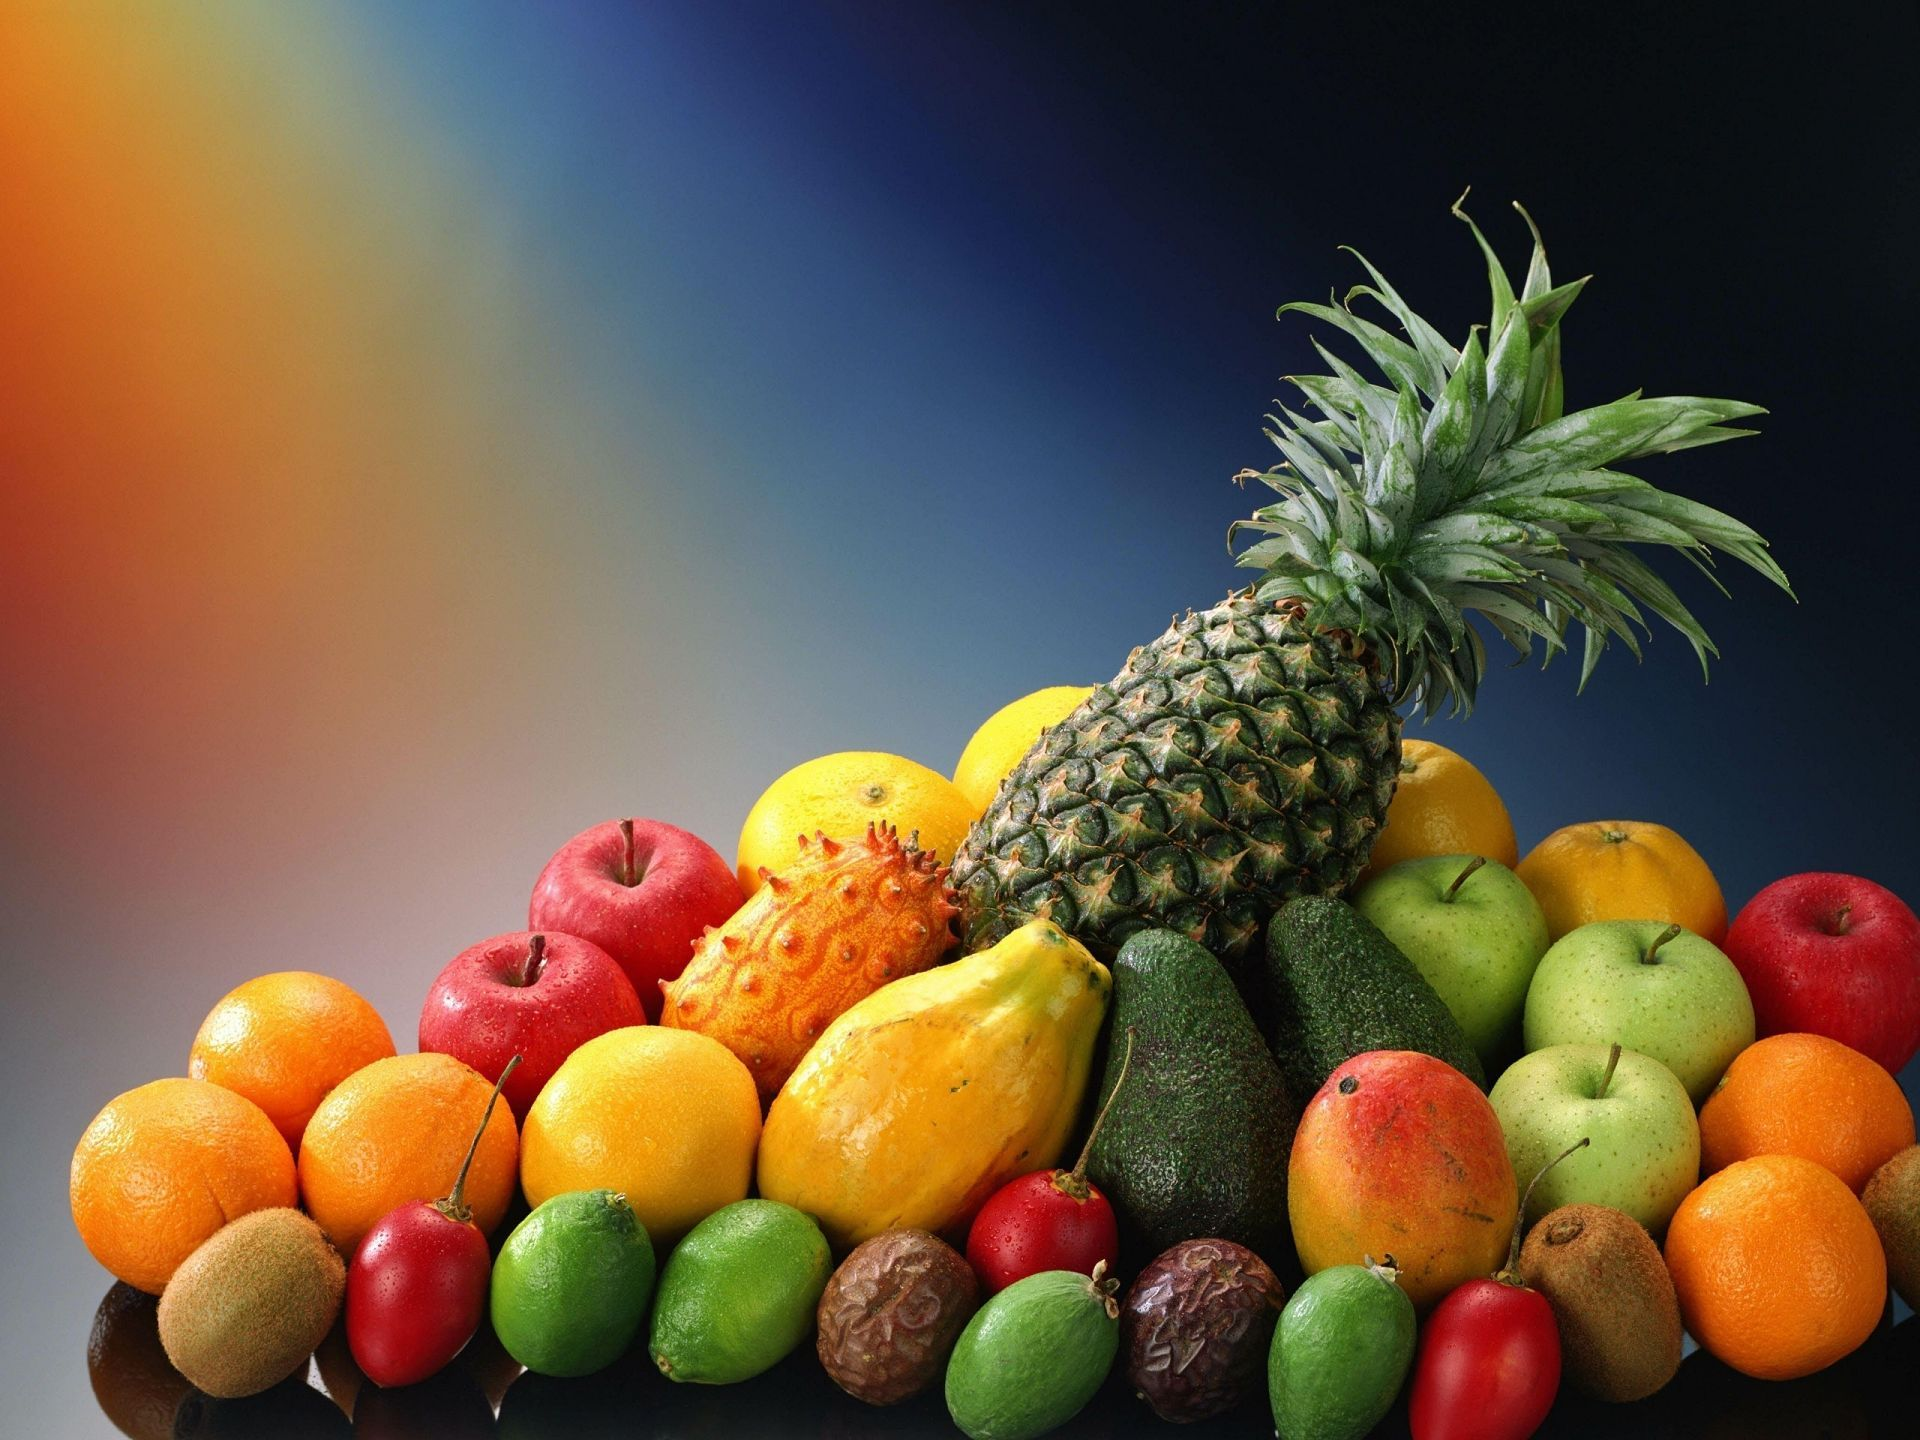 Fruits wallpapers for desktop HD Wallpaper 1920x1440